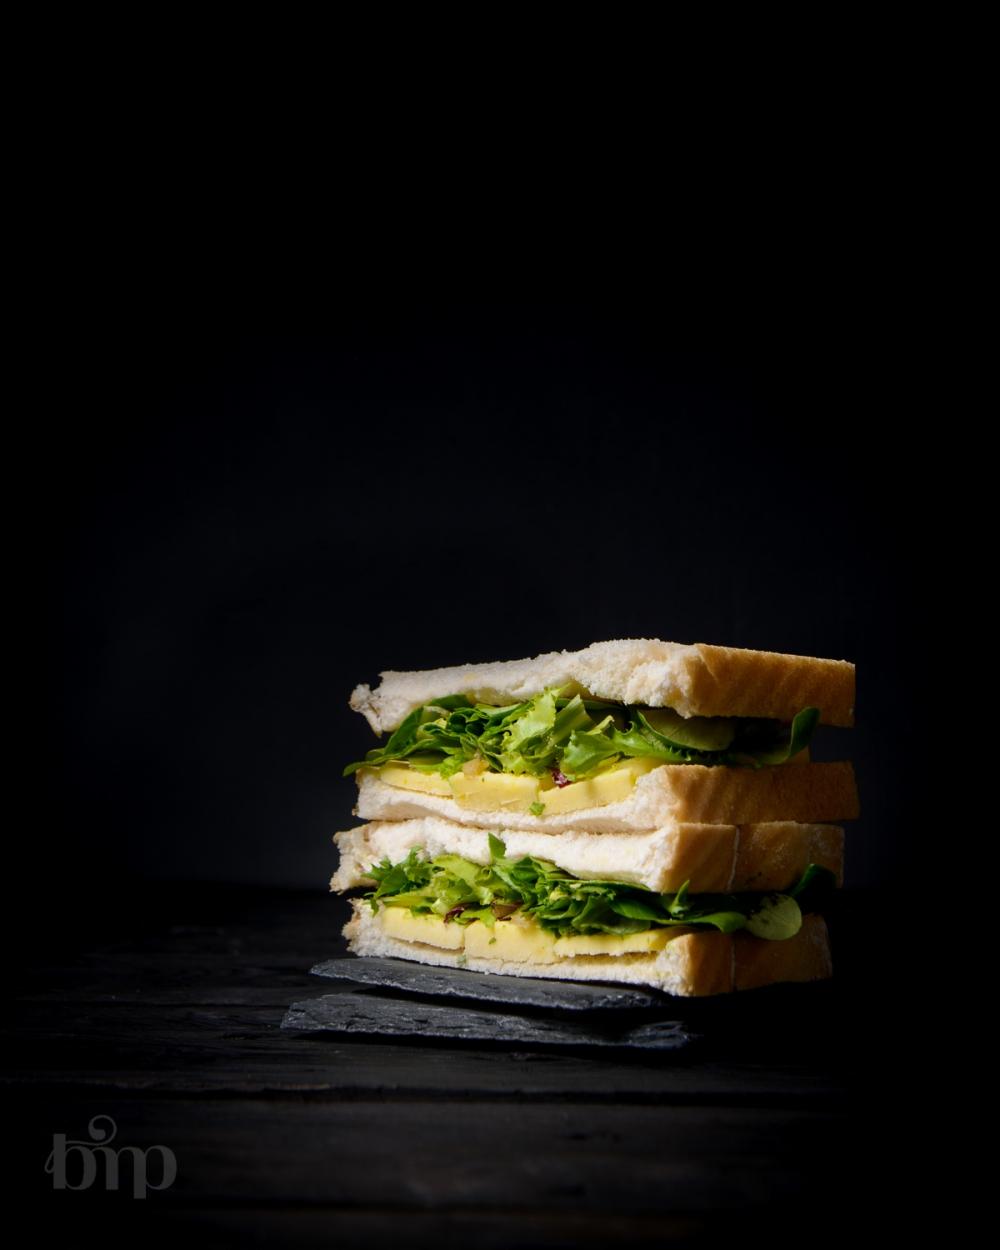 Bramarpla - Food Photography - Banangeddon-4